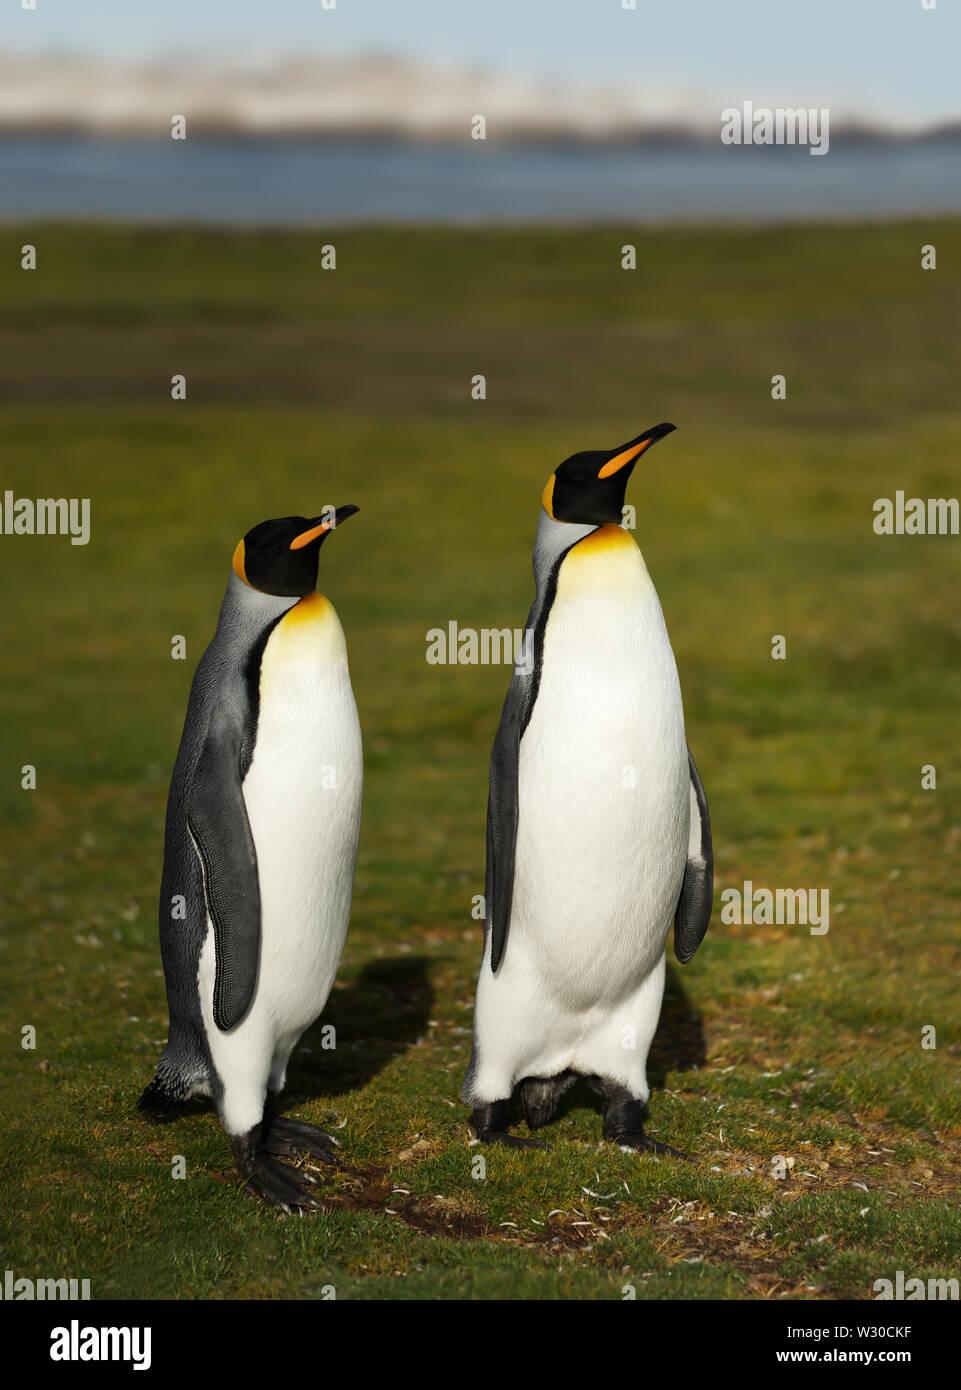 Close up of King penguins (Aptenodytes patagonicus) in Falkland Islands. Stock Photo